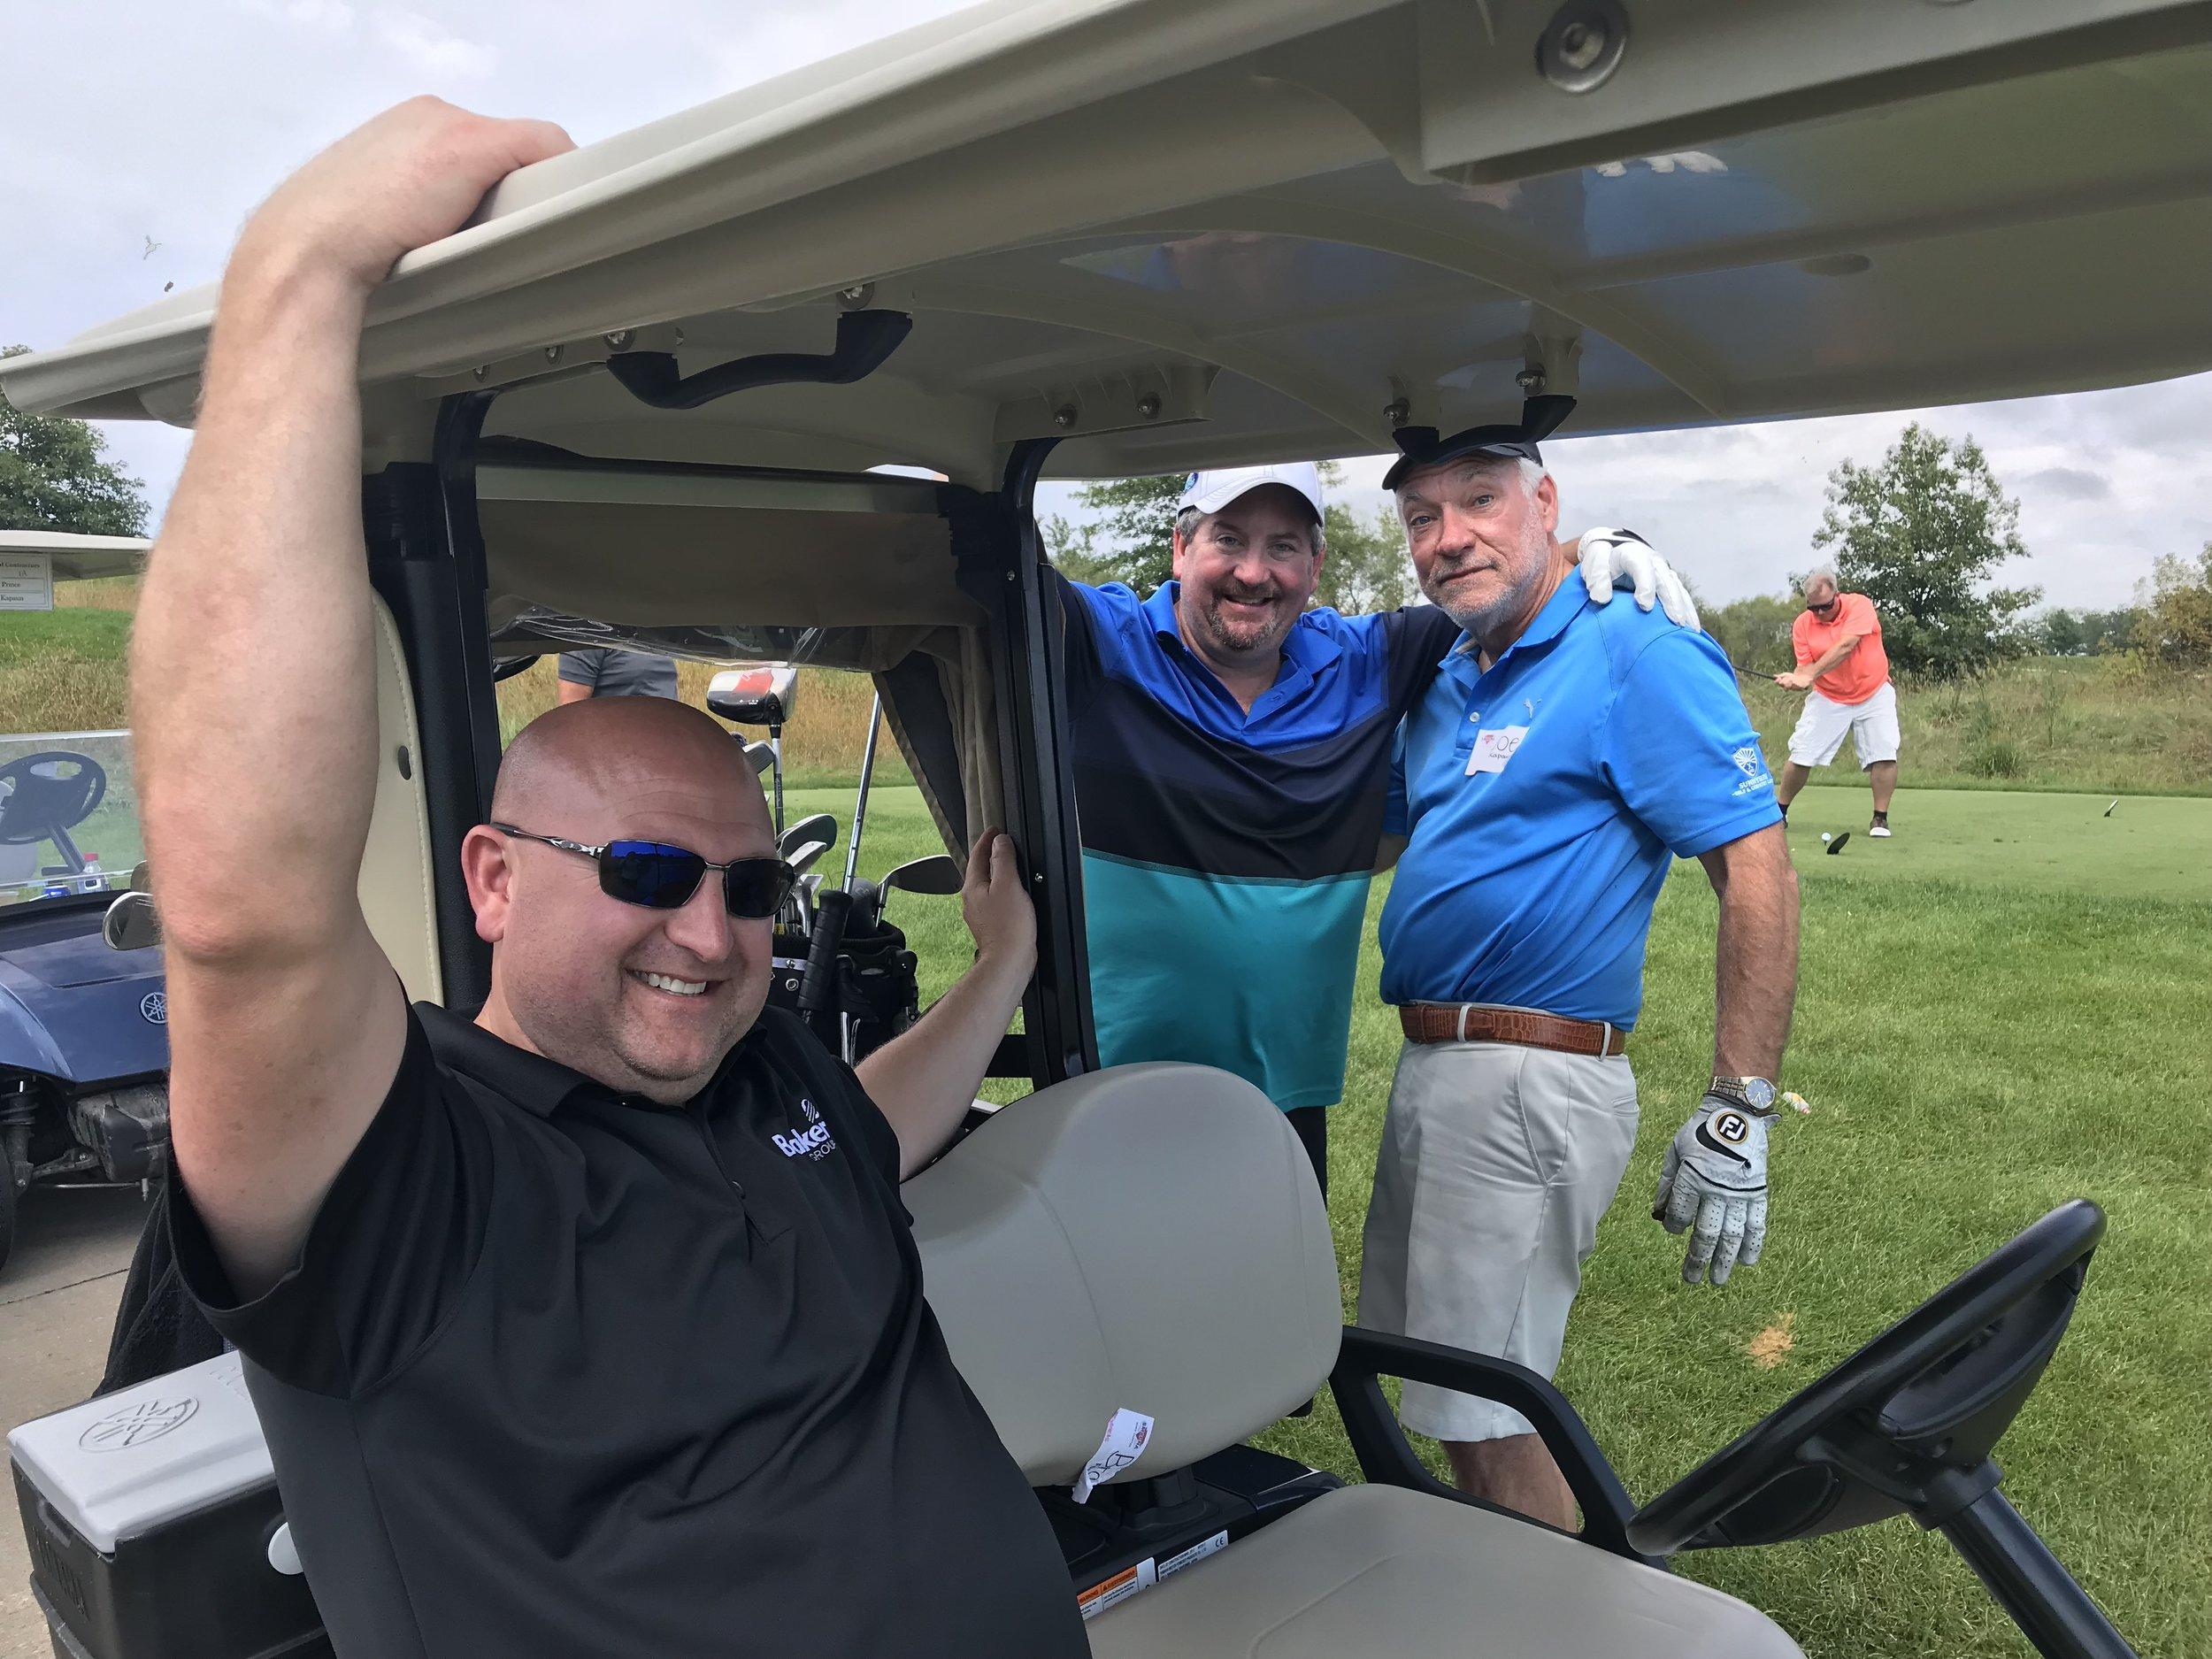 Jeff Jordan, Brad Forret and Joe Kapaun